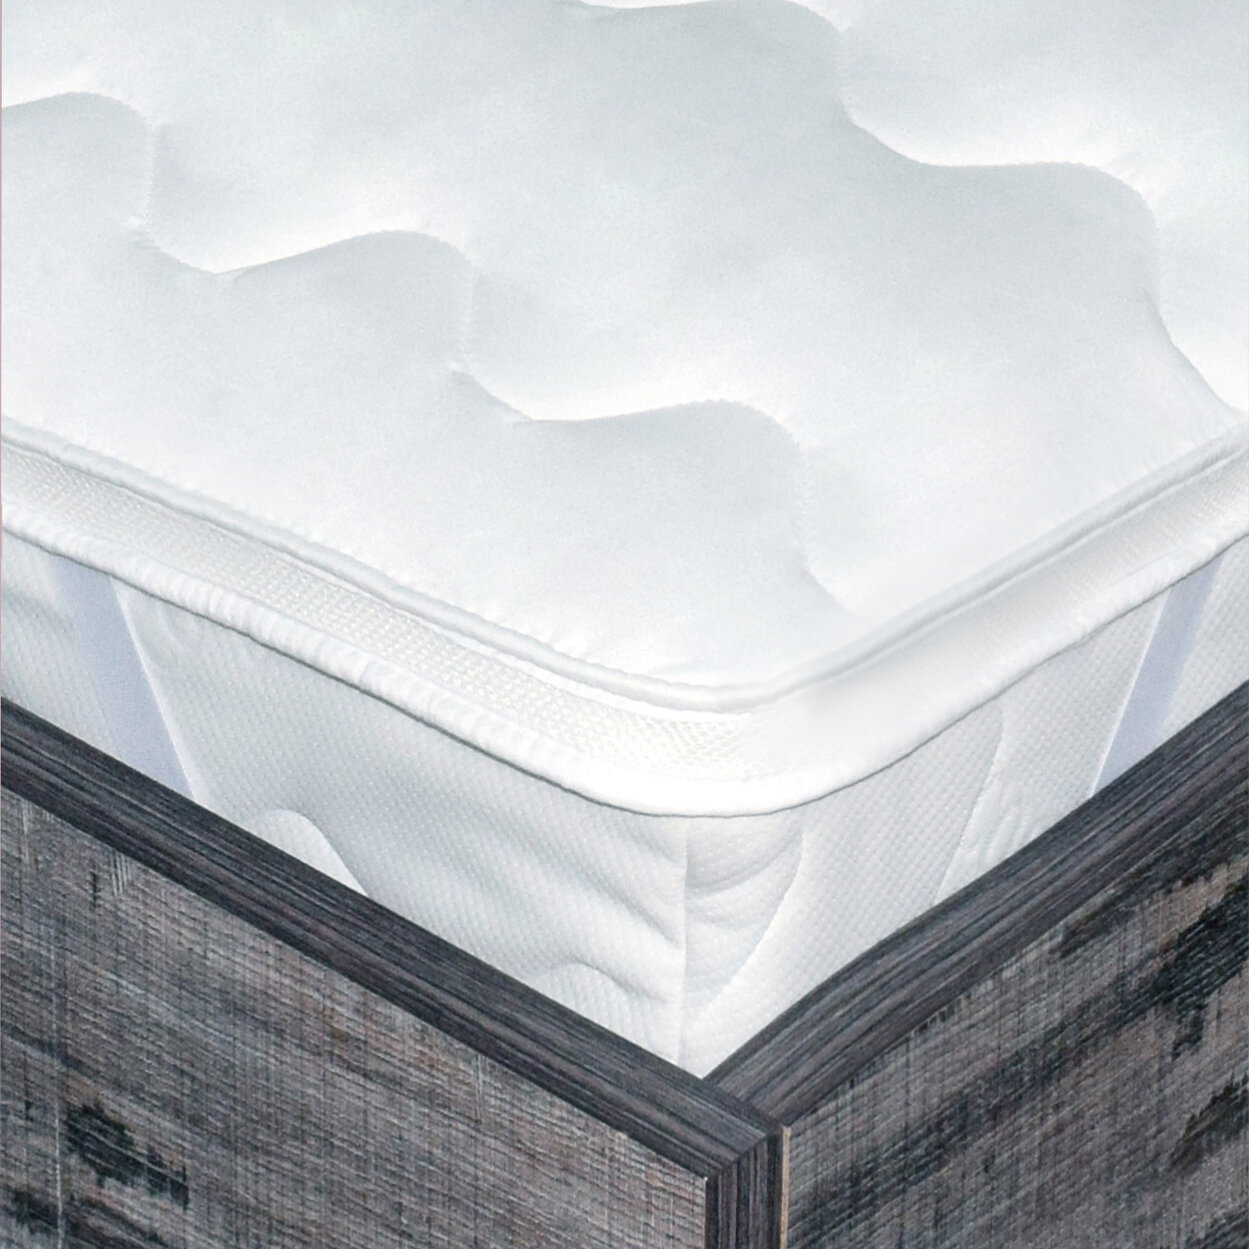 3cm Polyester Mattress Topper Reviews